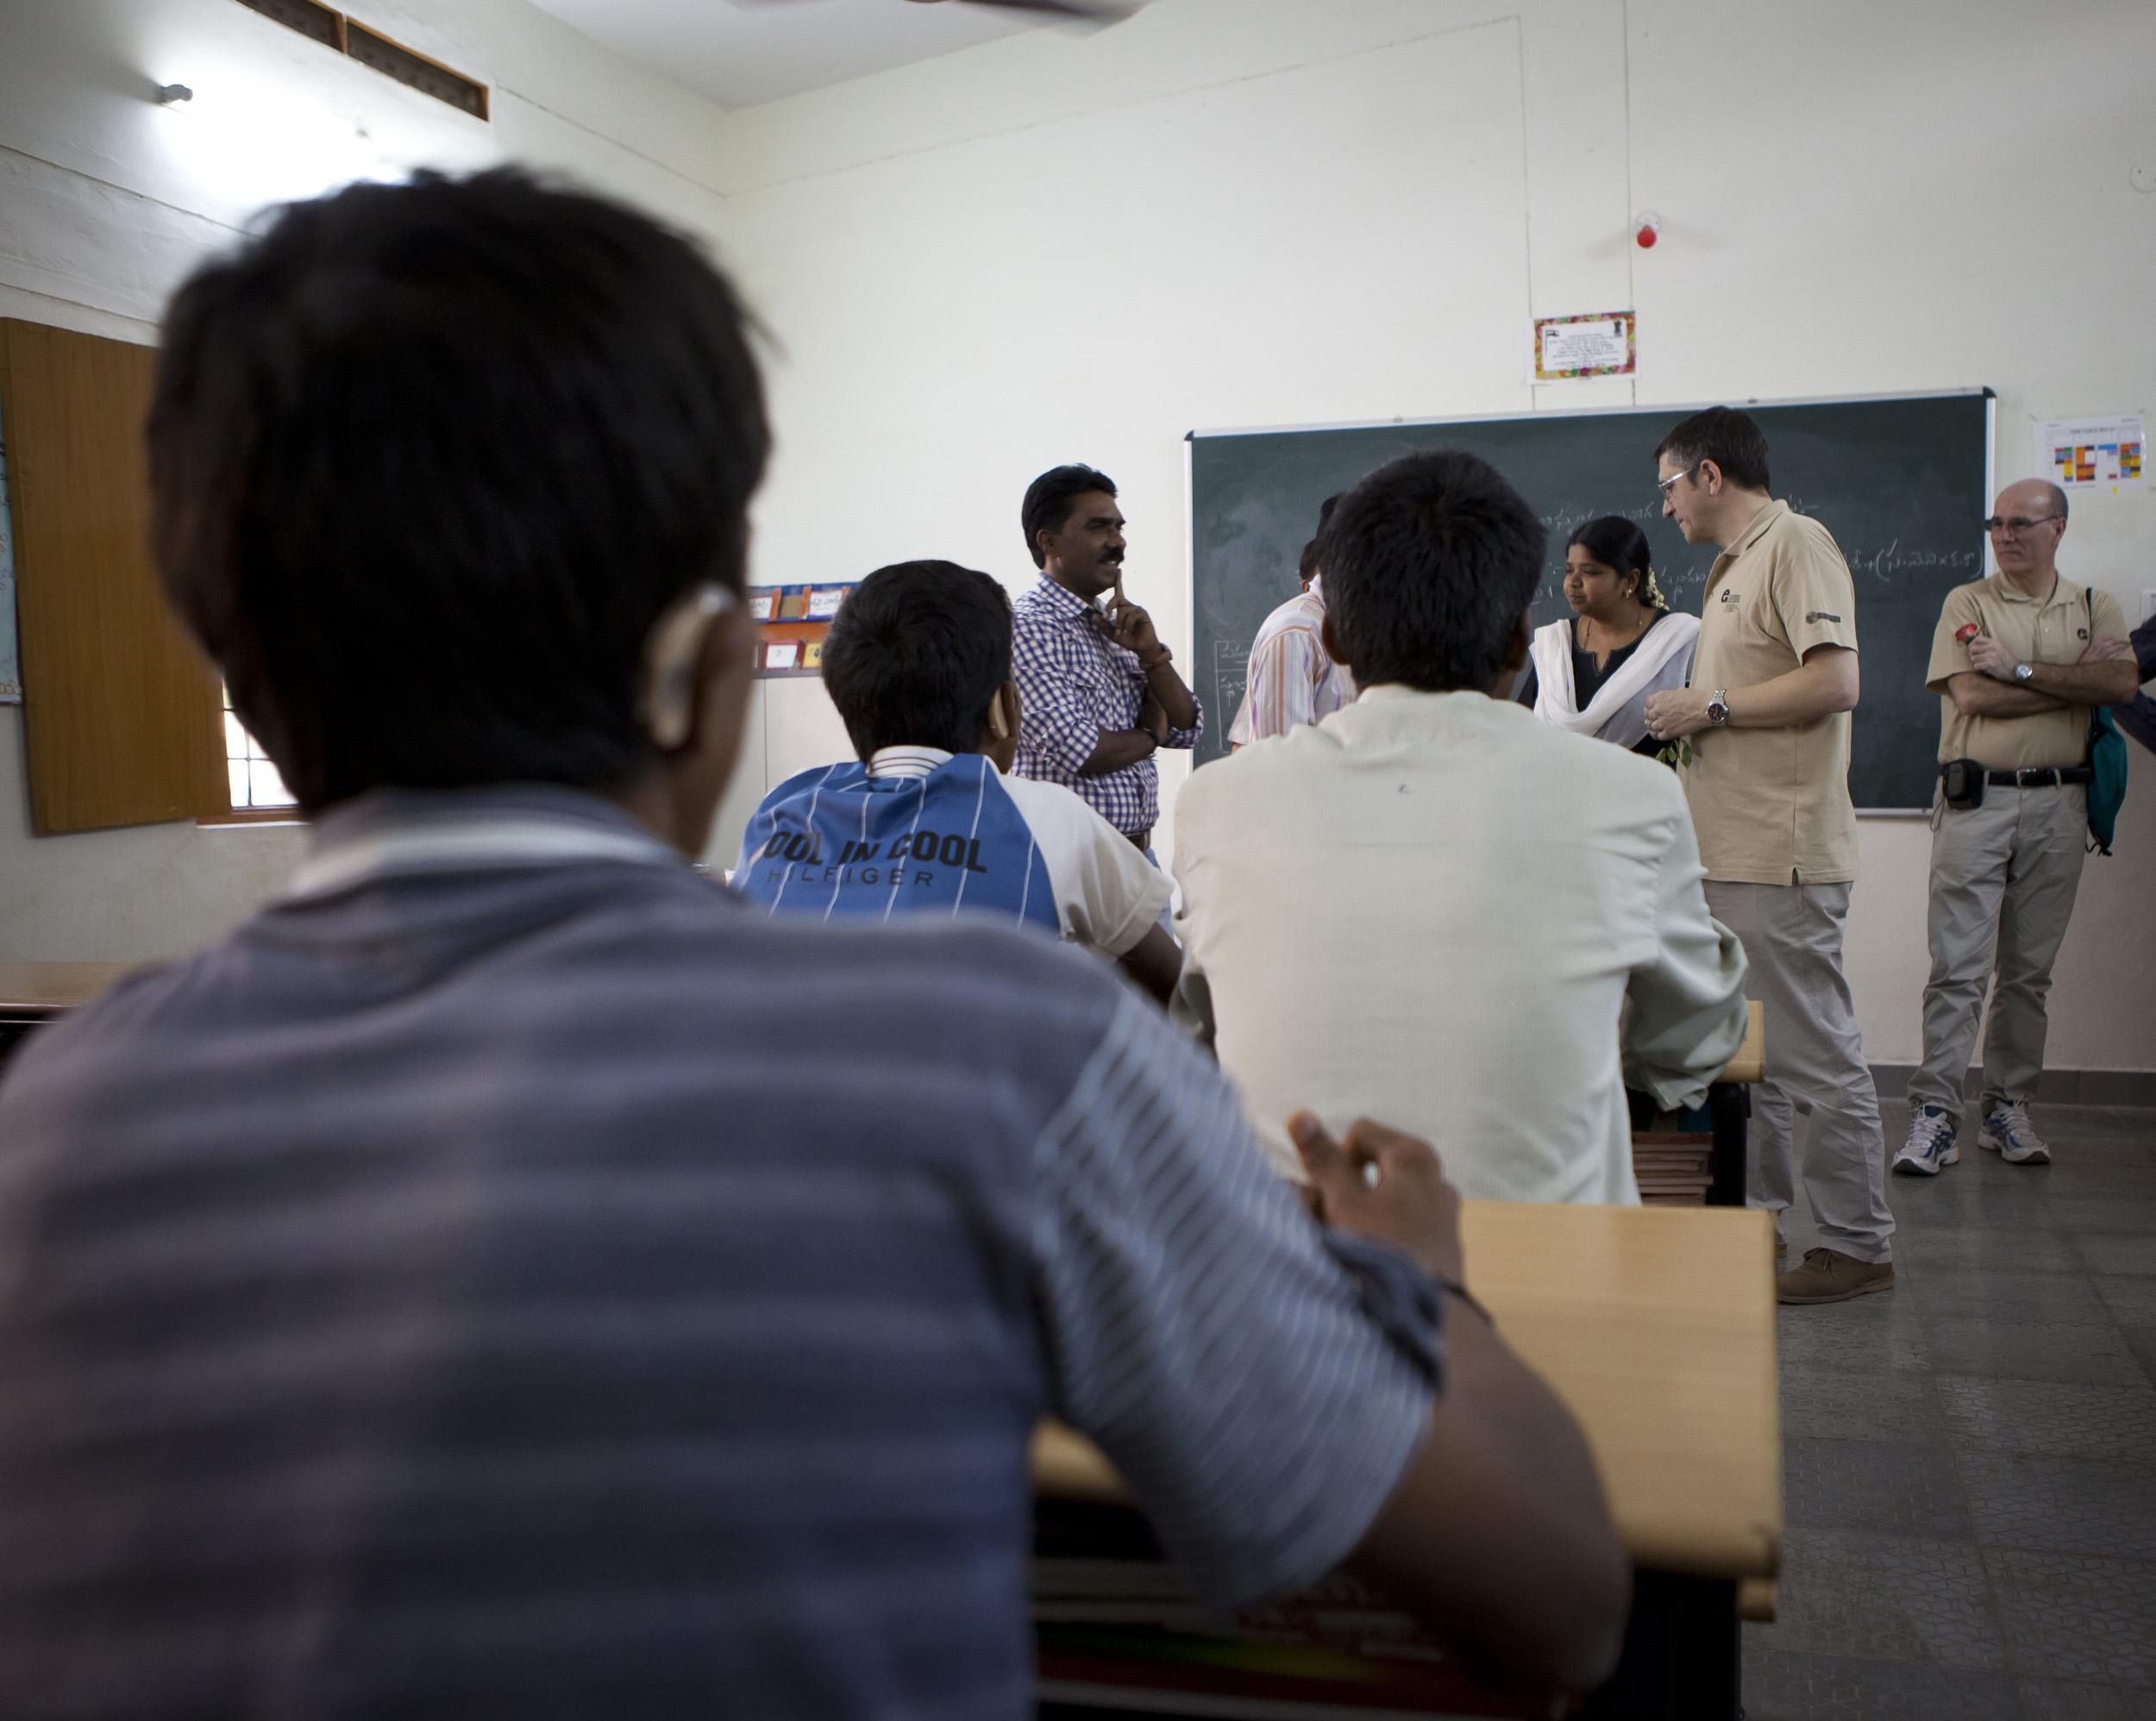 2012_03_17_vicente_ferrer_escuelas13.jpg